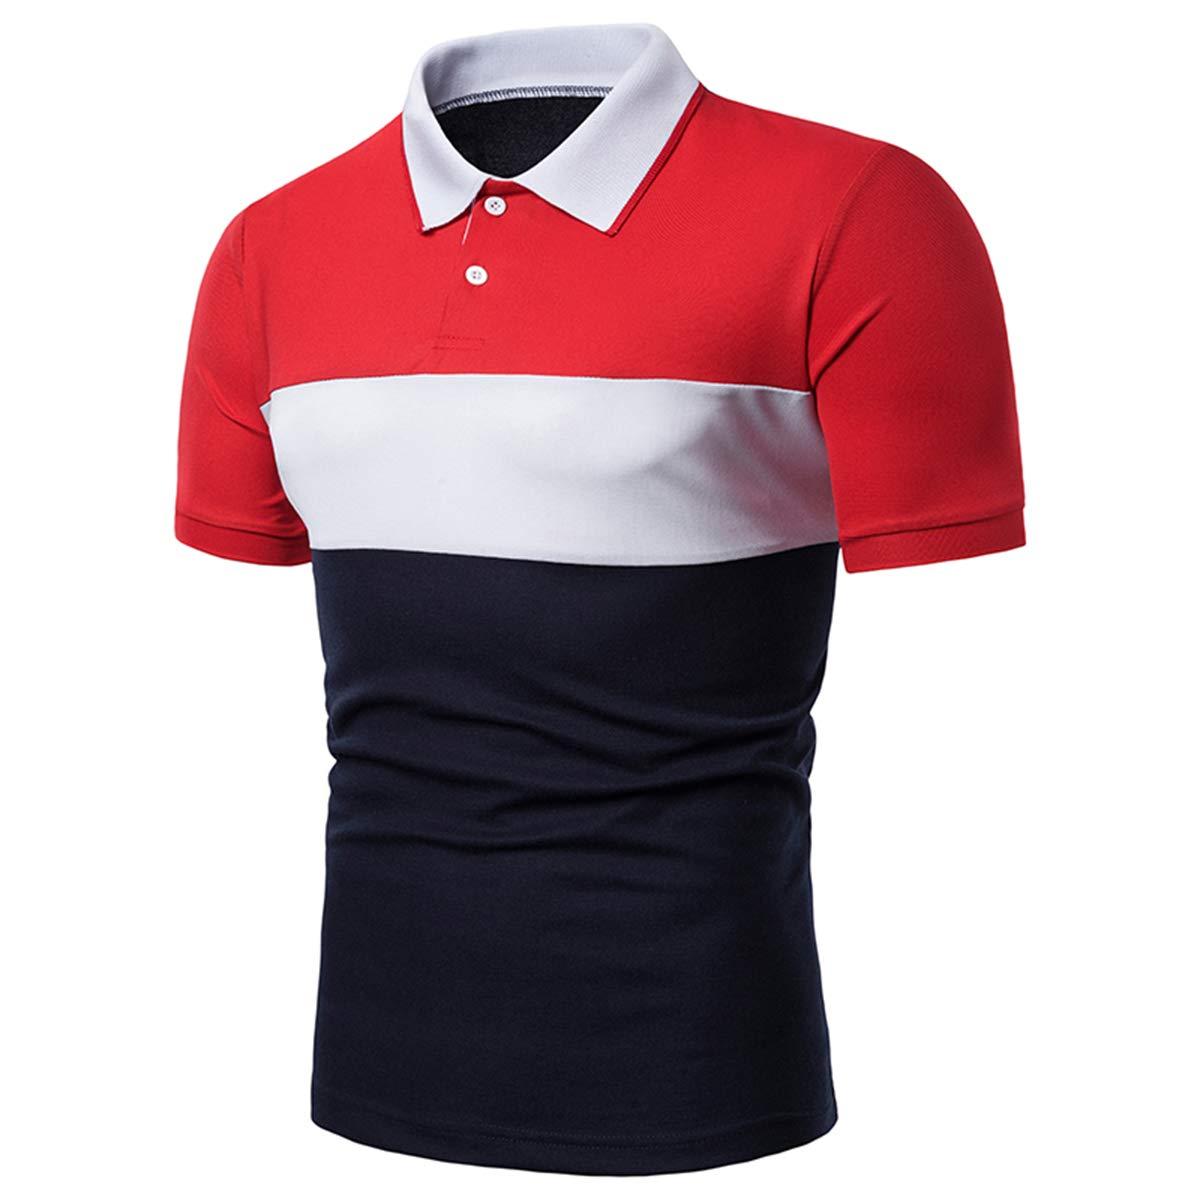 e885b04d75 Cindeyar Herren Poloshirt Polohemd Kurzarm Farbblock T-Shirt Sommer Basic  Slim Fit Polo Shirt product